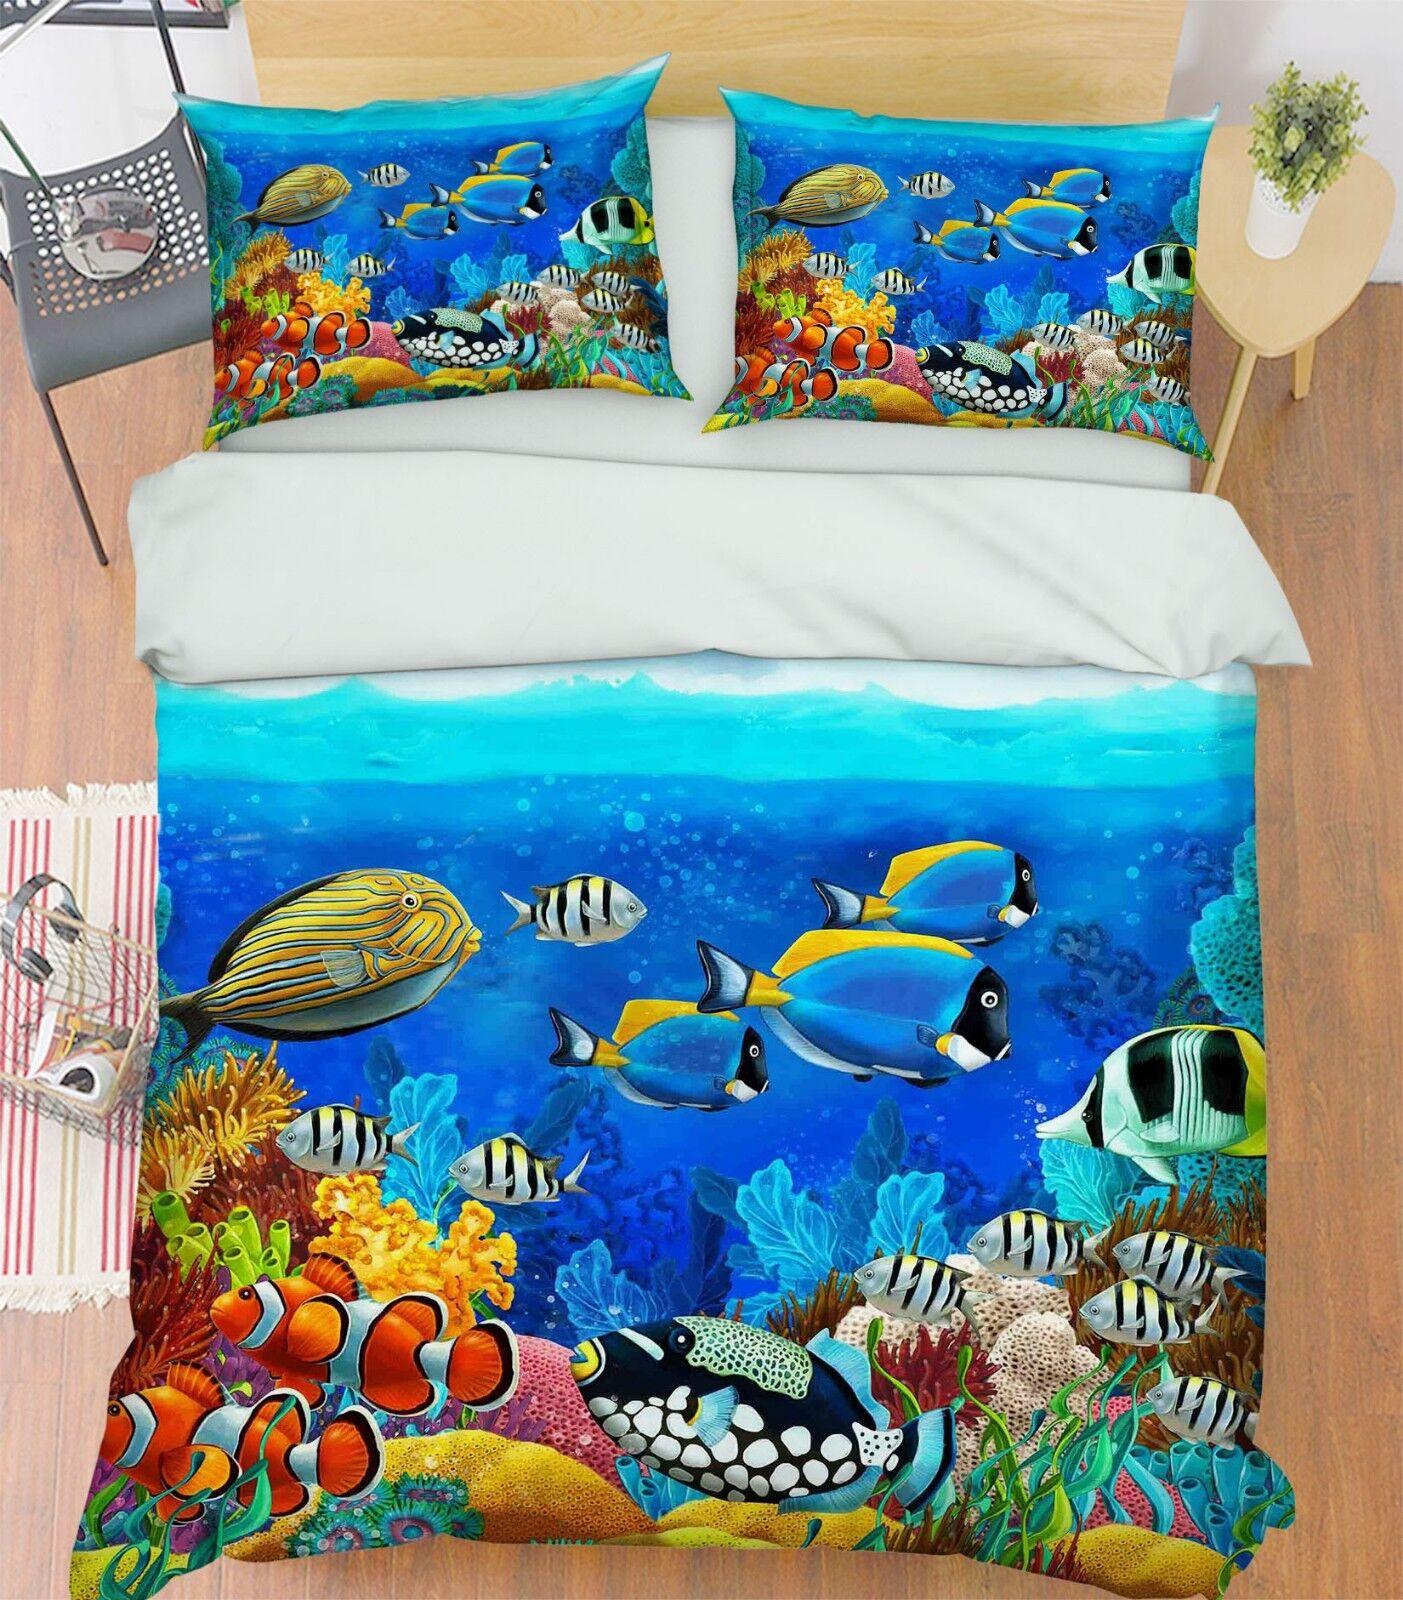 3D Ocean Fish 797 Bed Pillowcases Quilt Duvet Cover Set Single Queen King CA